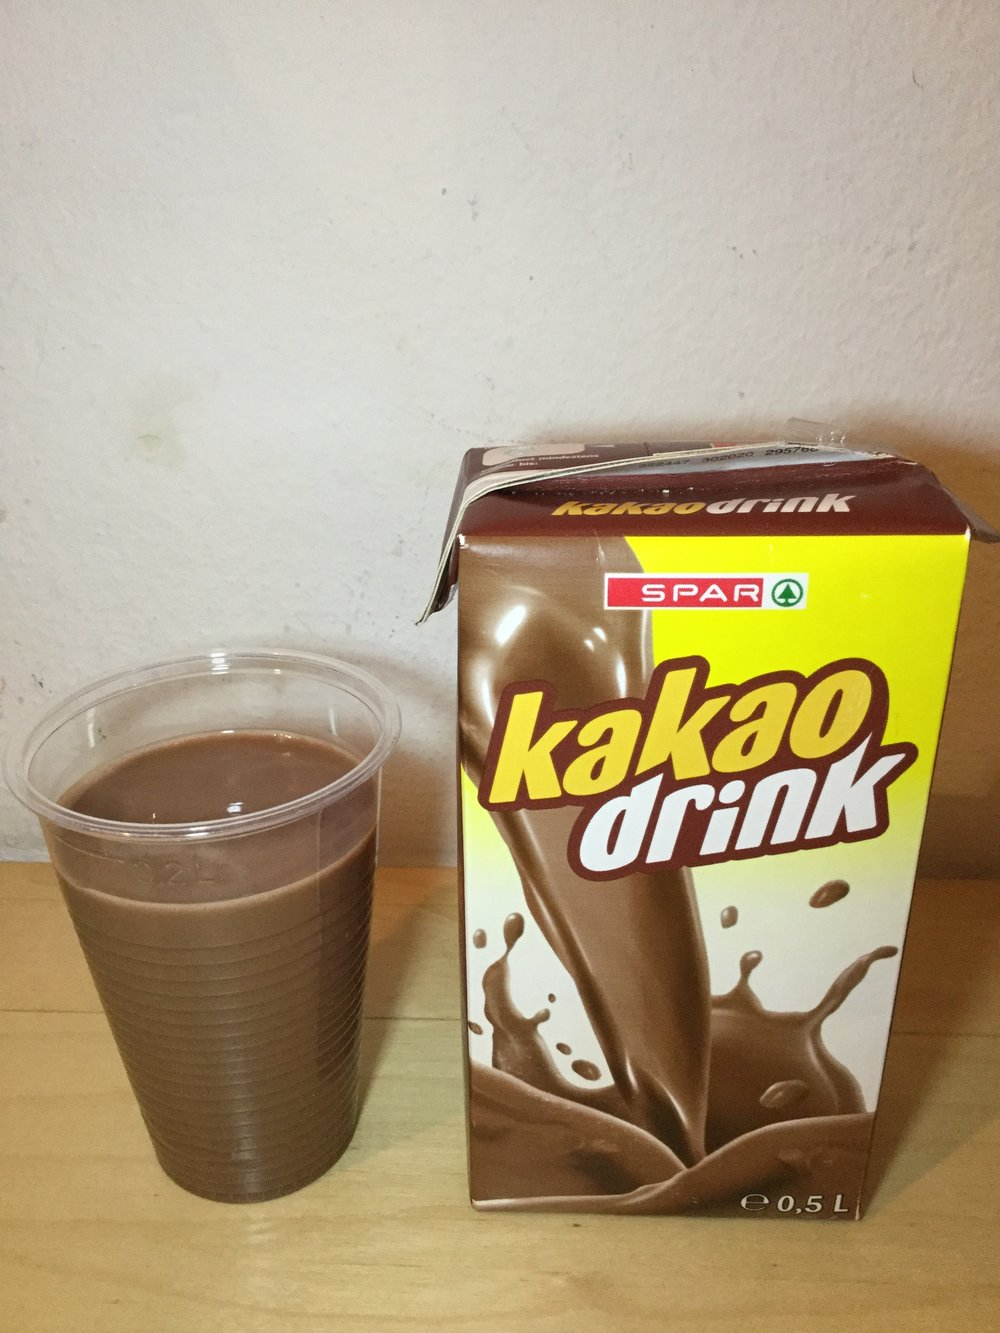 Spar Kakao Drink Cup